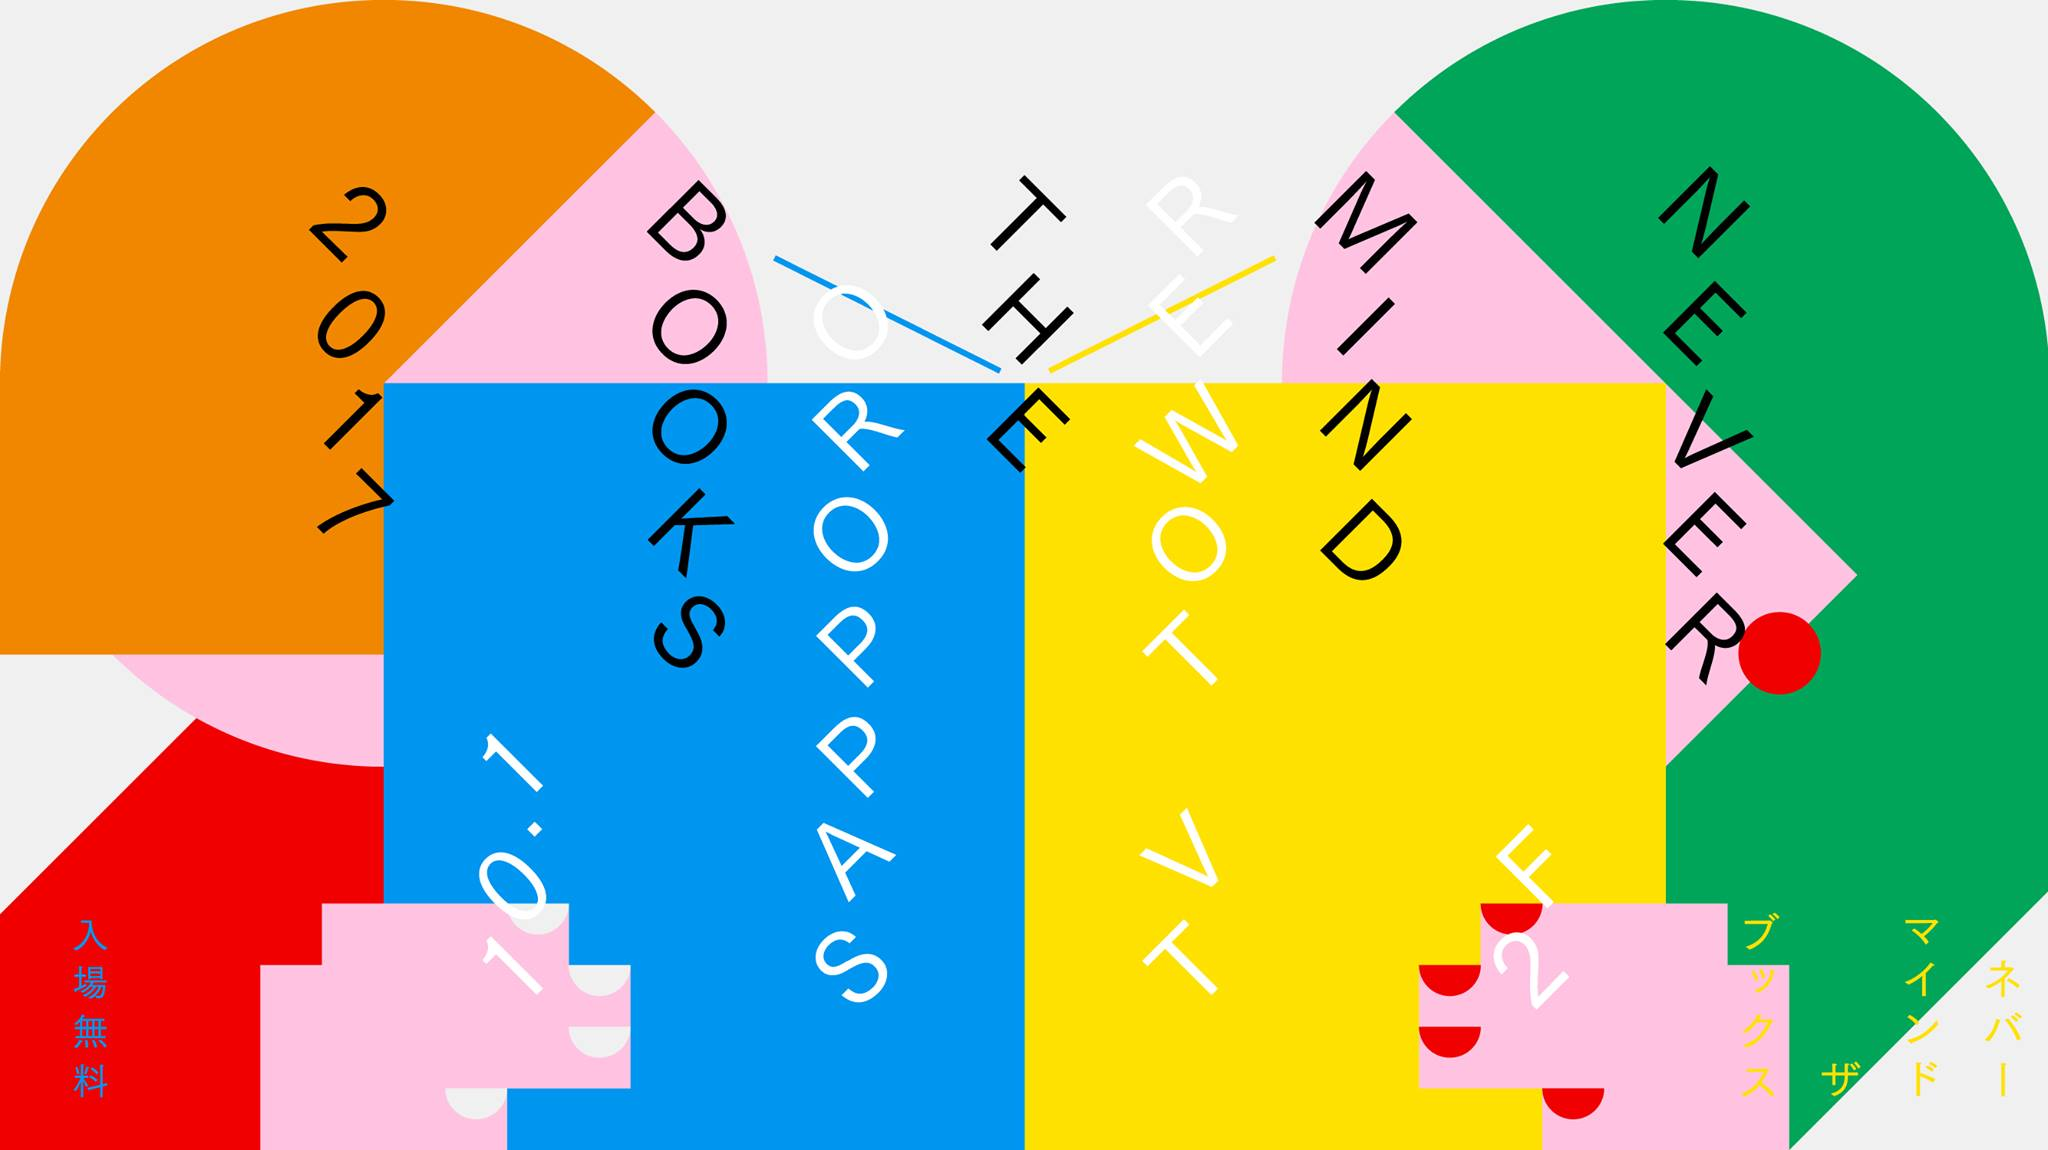 NEVER MIND THE BOOKS テレビ塔 札幌 イベント出展 刺繍雑貨